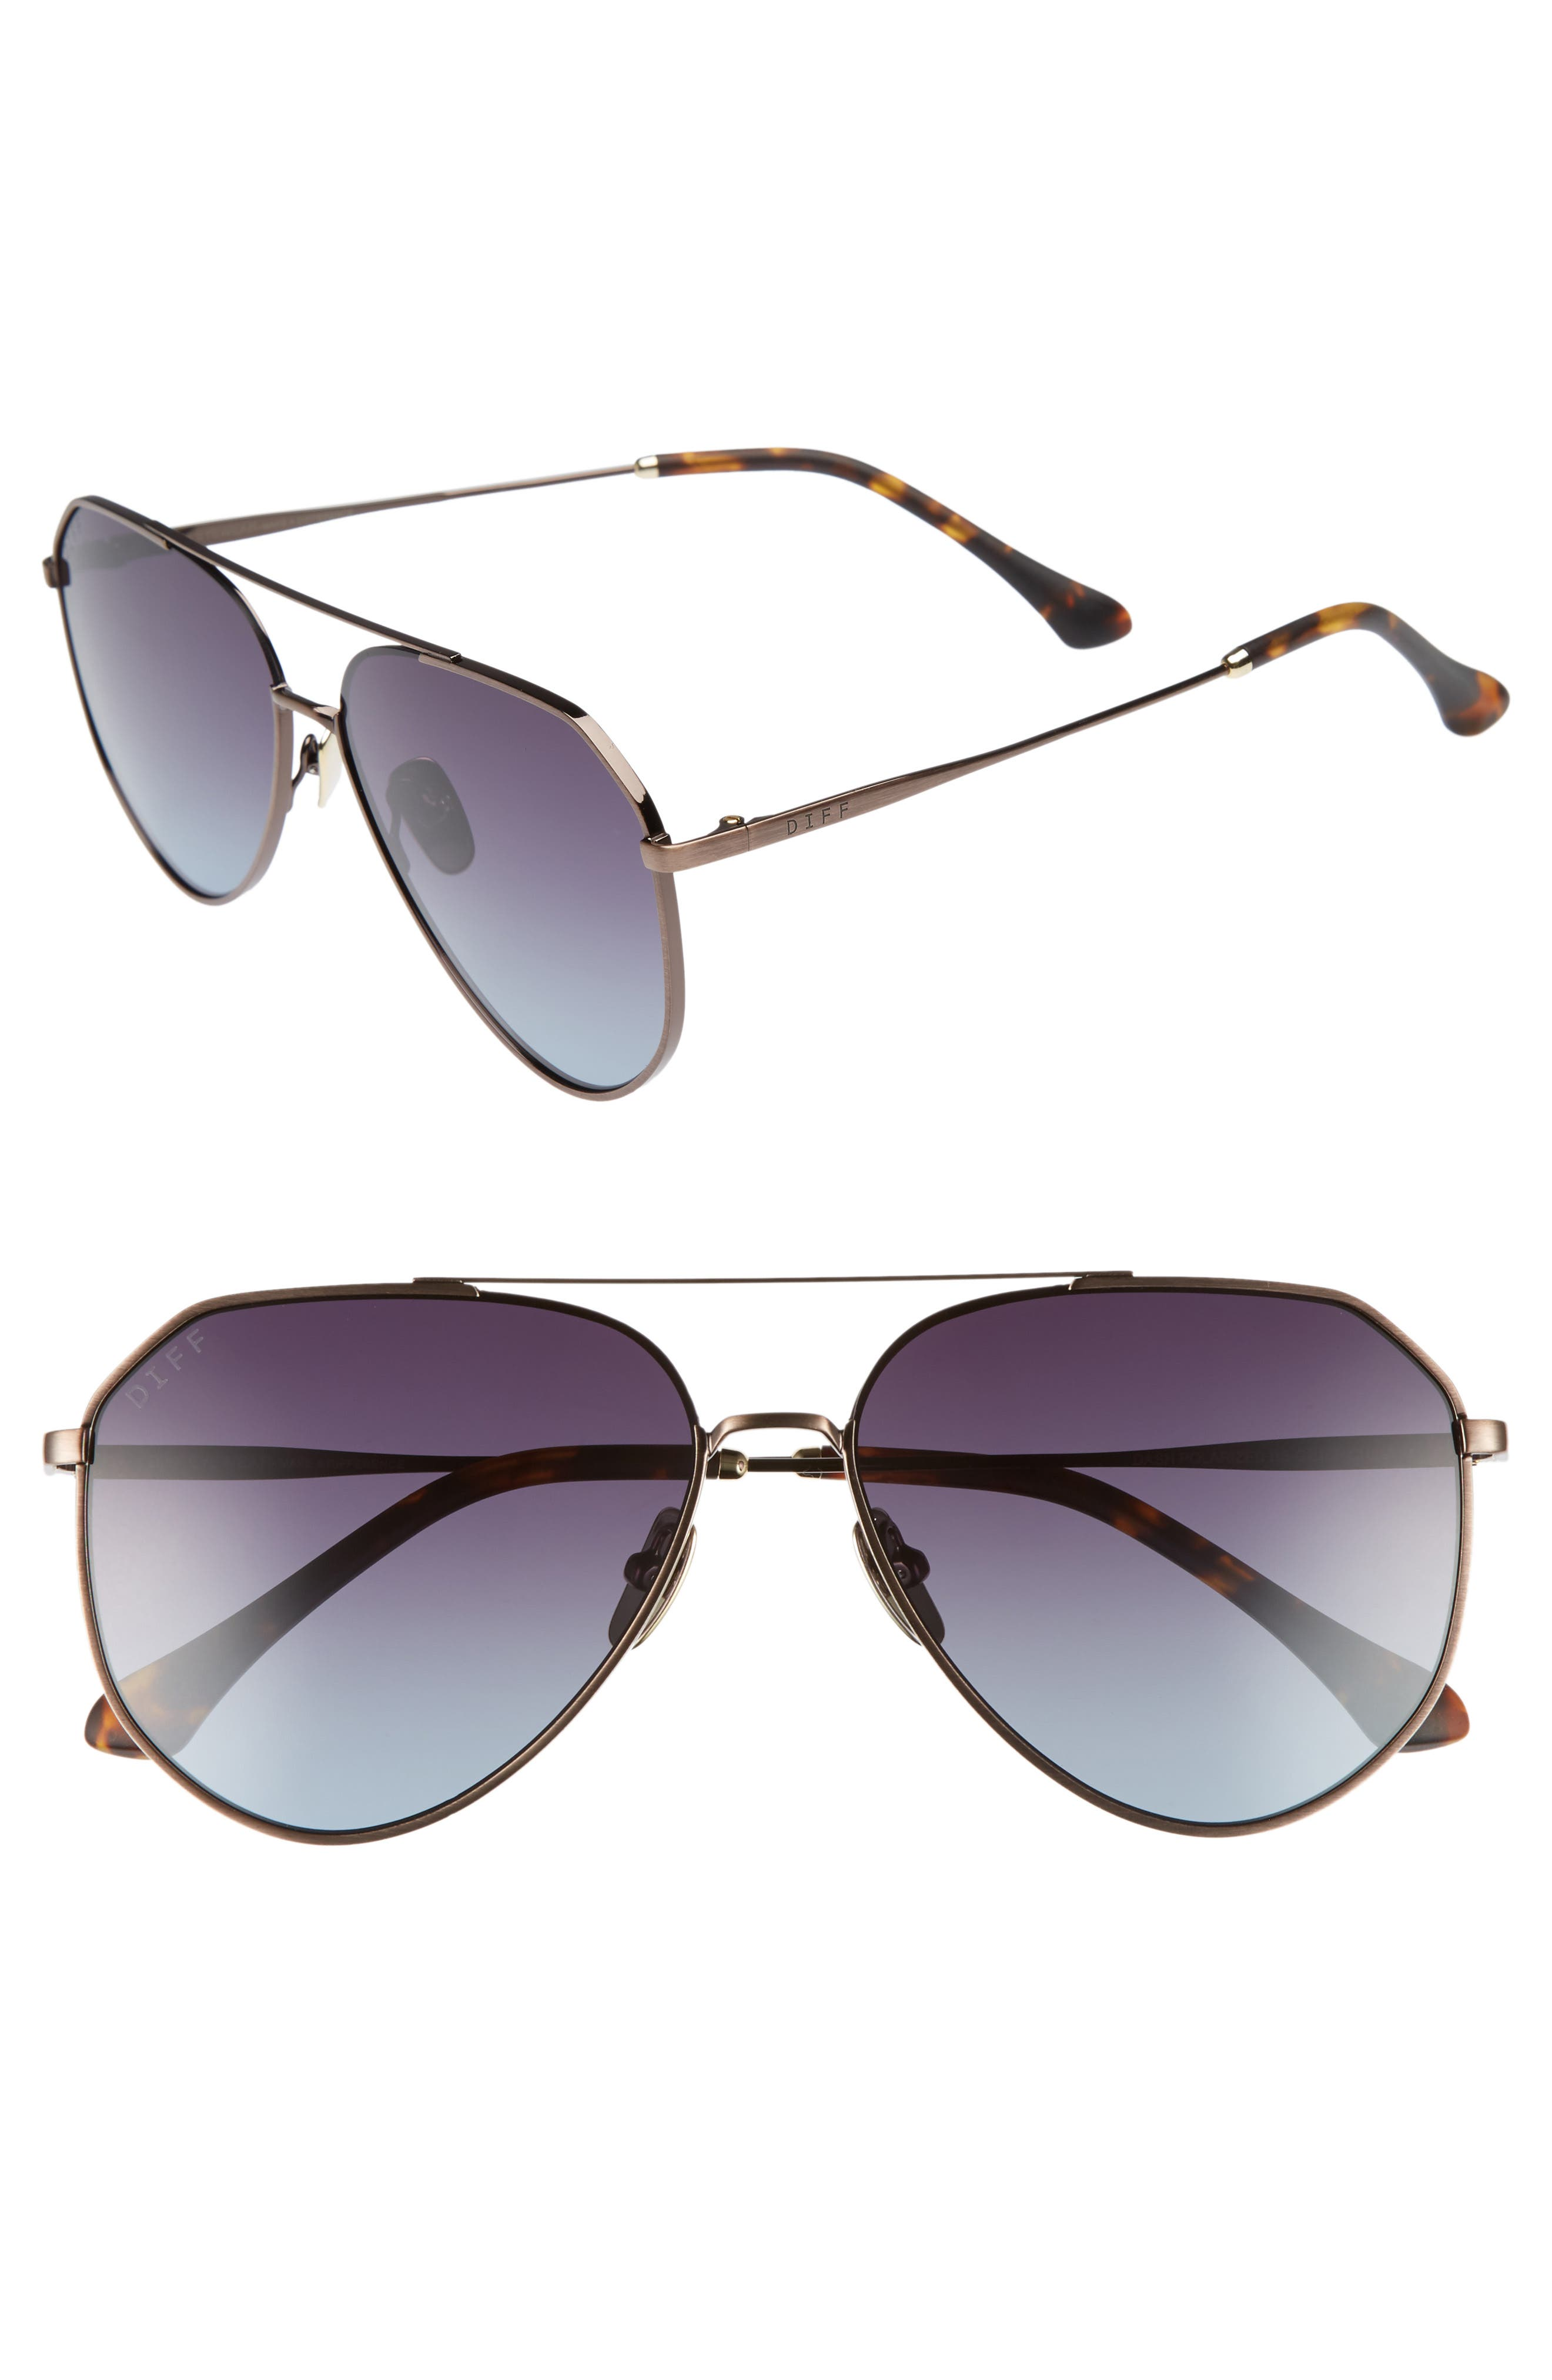 4ed46de3df Fake Oakley Sunglasses Livestrong Bracelet « One More Soul